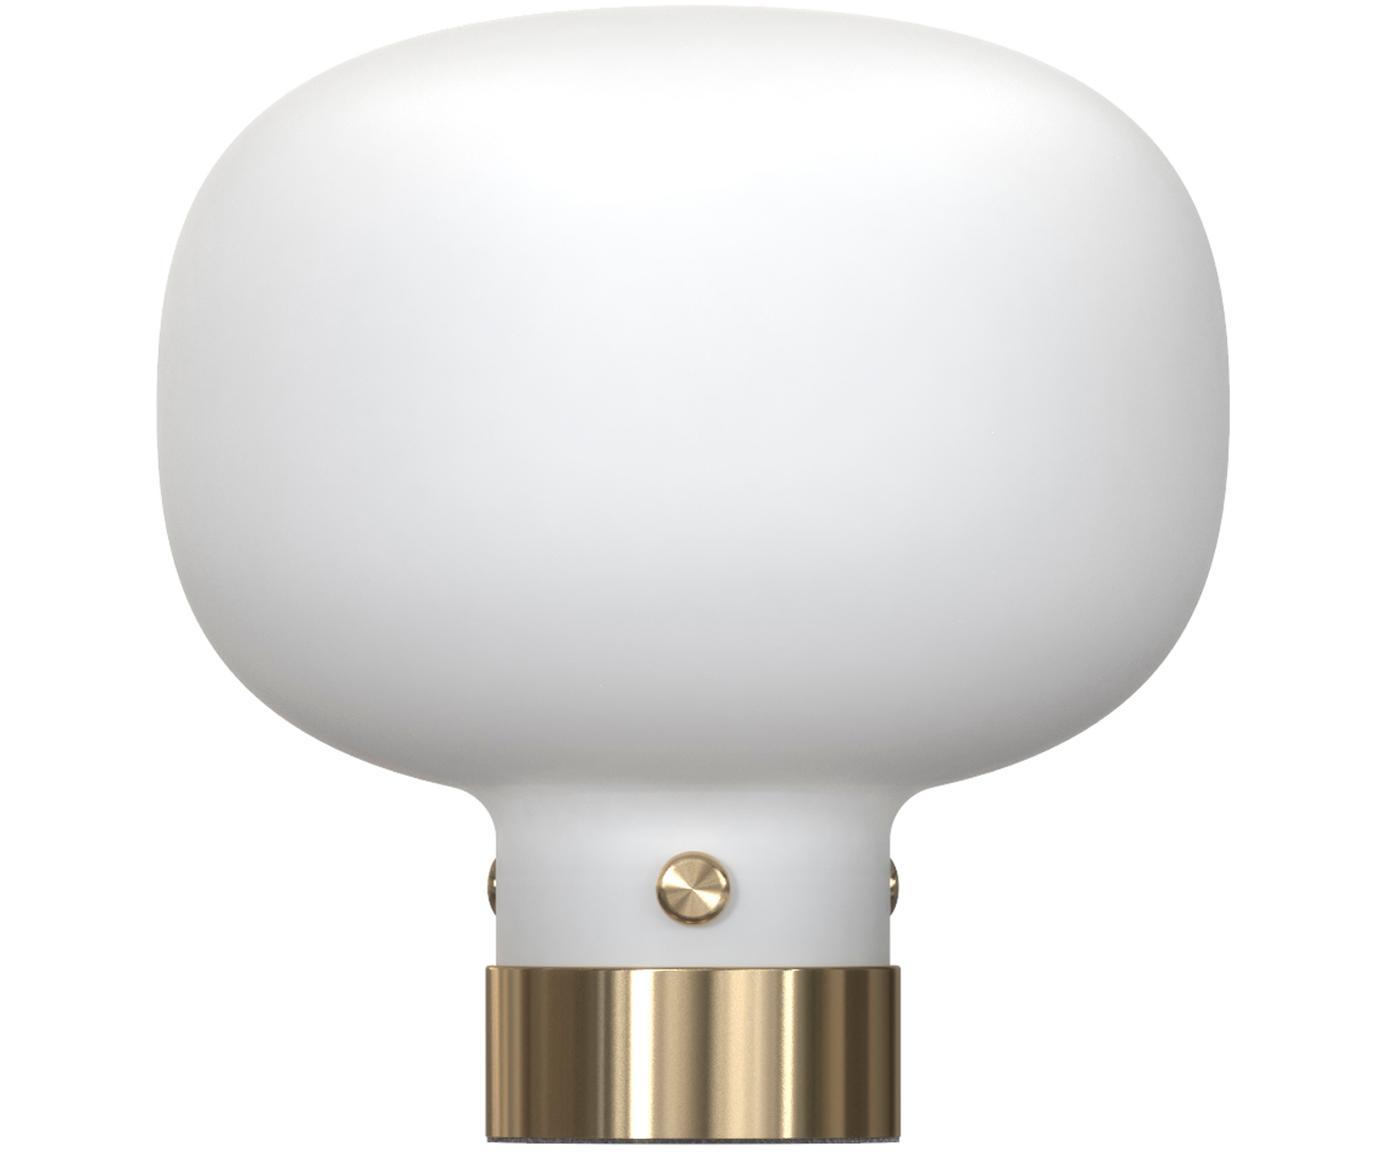 Lámpara de mesa Raito, Vidrio opalino, metal, Blanco opalino, latón, Ø 20 x Al 21 cm